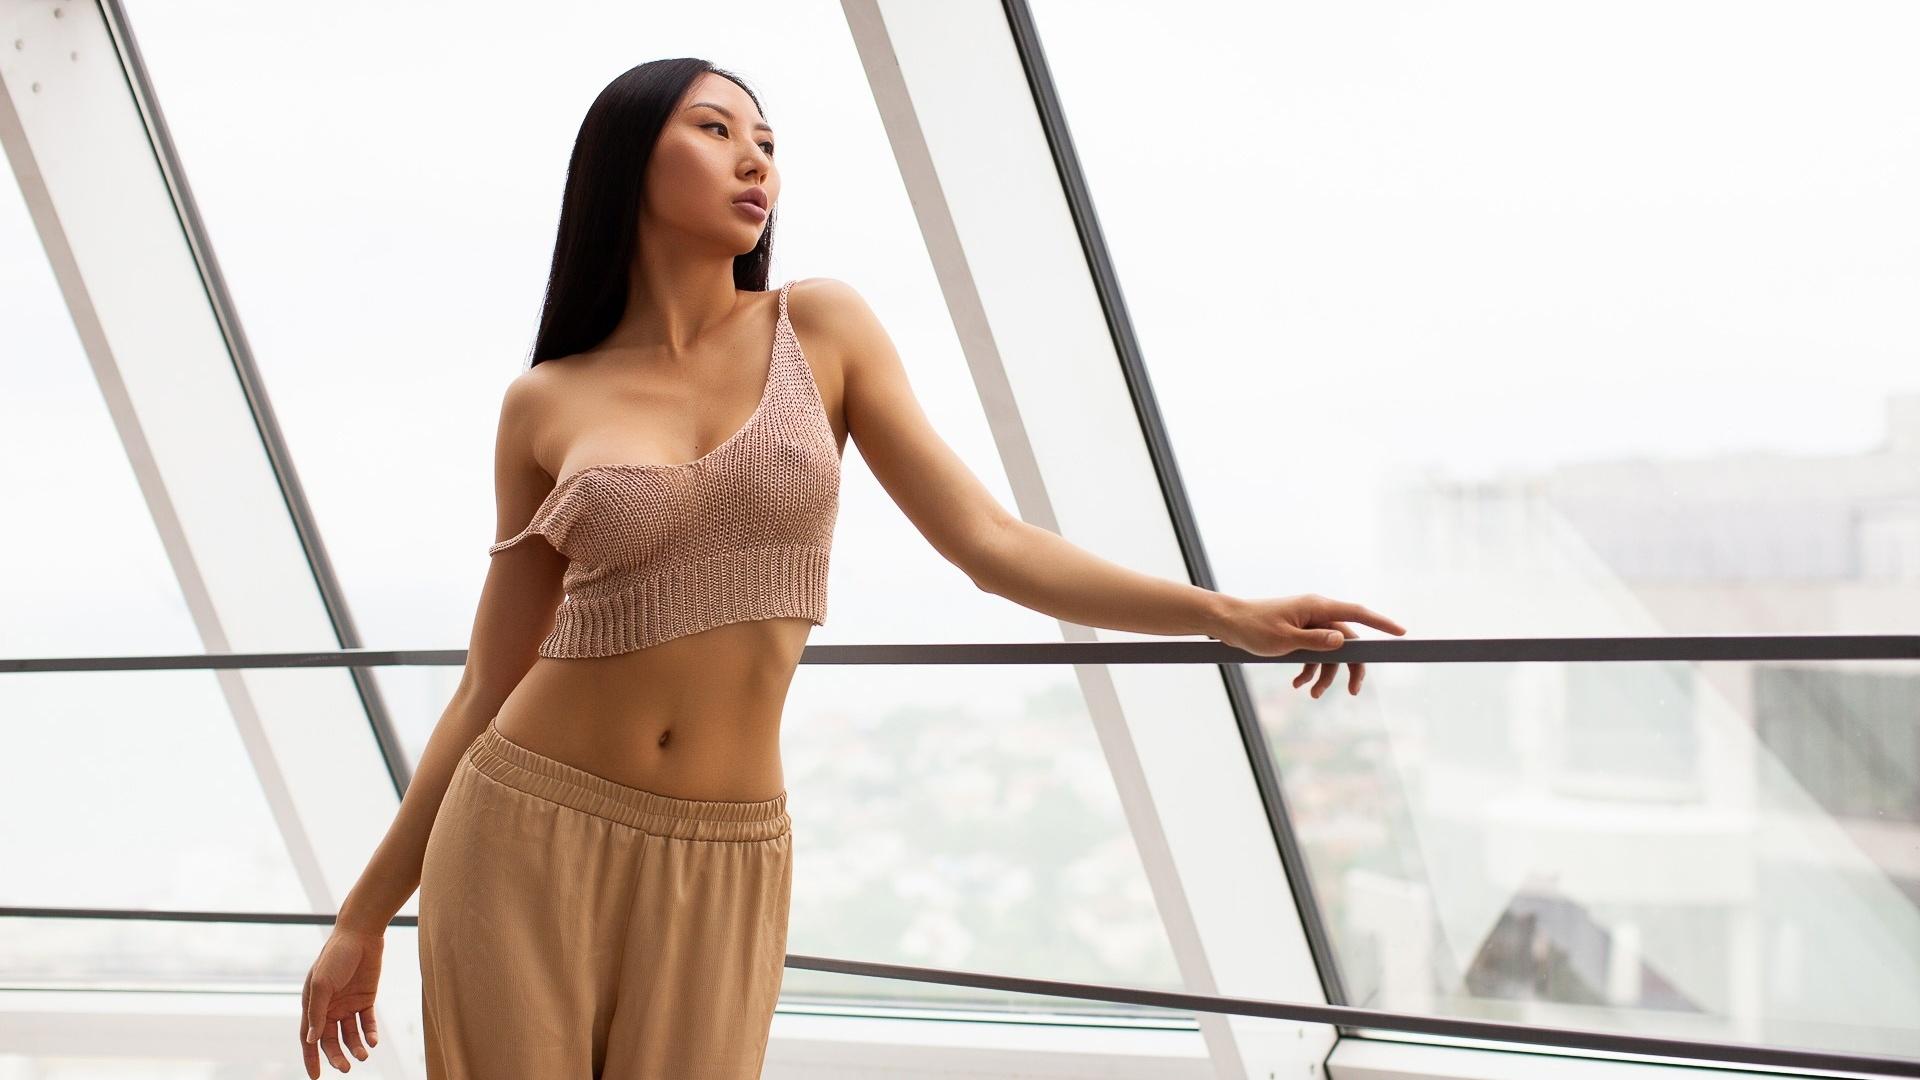 women, asian, no bra, women indoors, alexander grinn, belly, ribs, window, nipples through clothing, fence